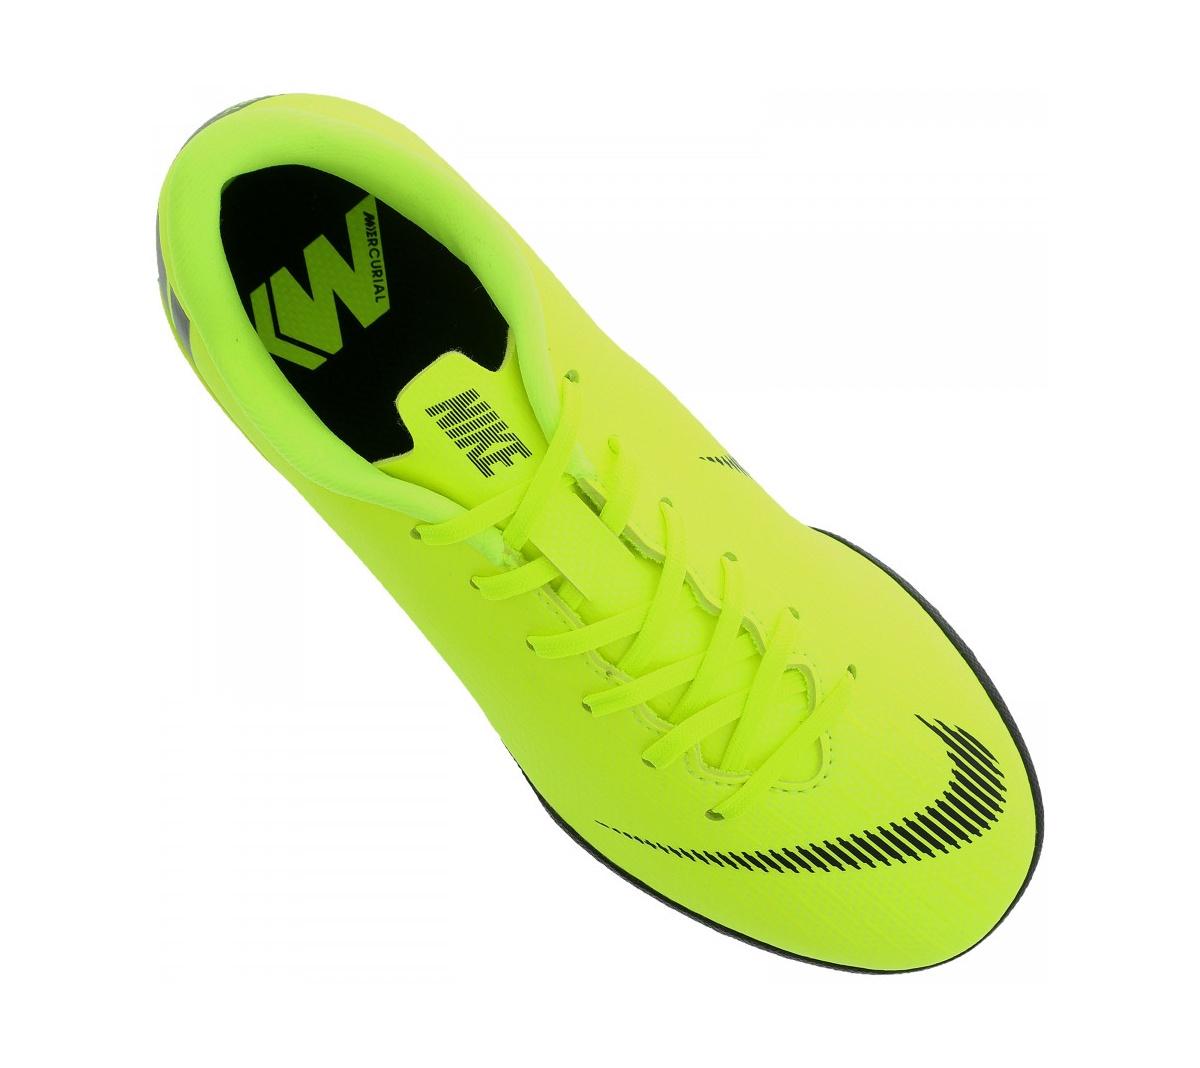 ba3023c1cf5c4 Chuteira Nike Mercurial Vapor 12 Academy Society Infantil - Mundo do ...